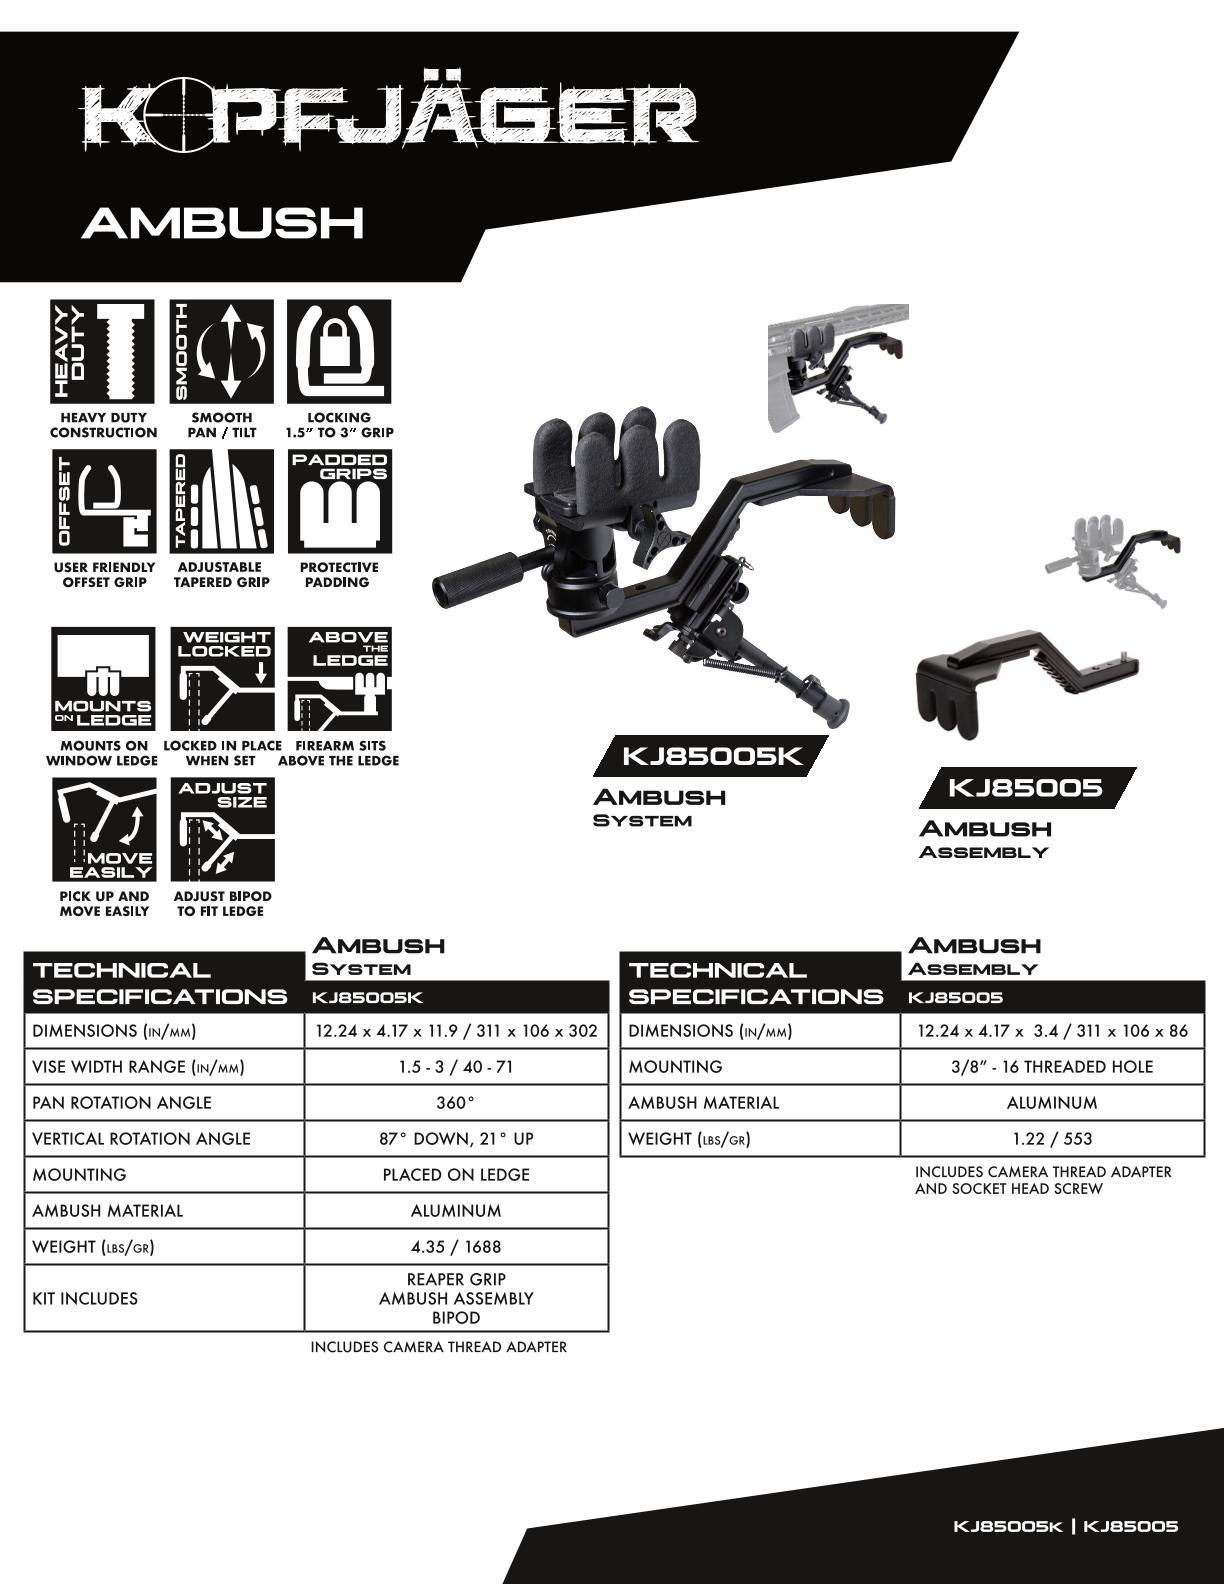 KOPFJ-GER-Ambush-Rest-Kit-includes-bipod-and-Reaper-Grip-KJ85005K